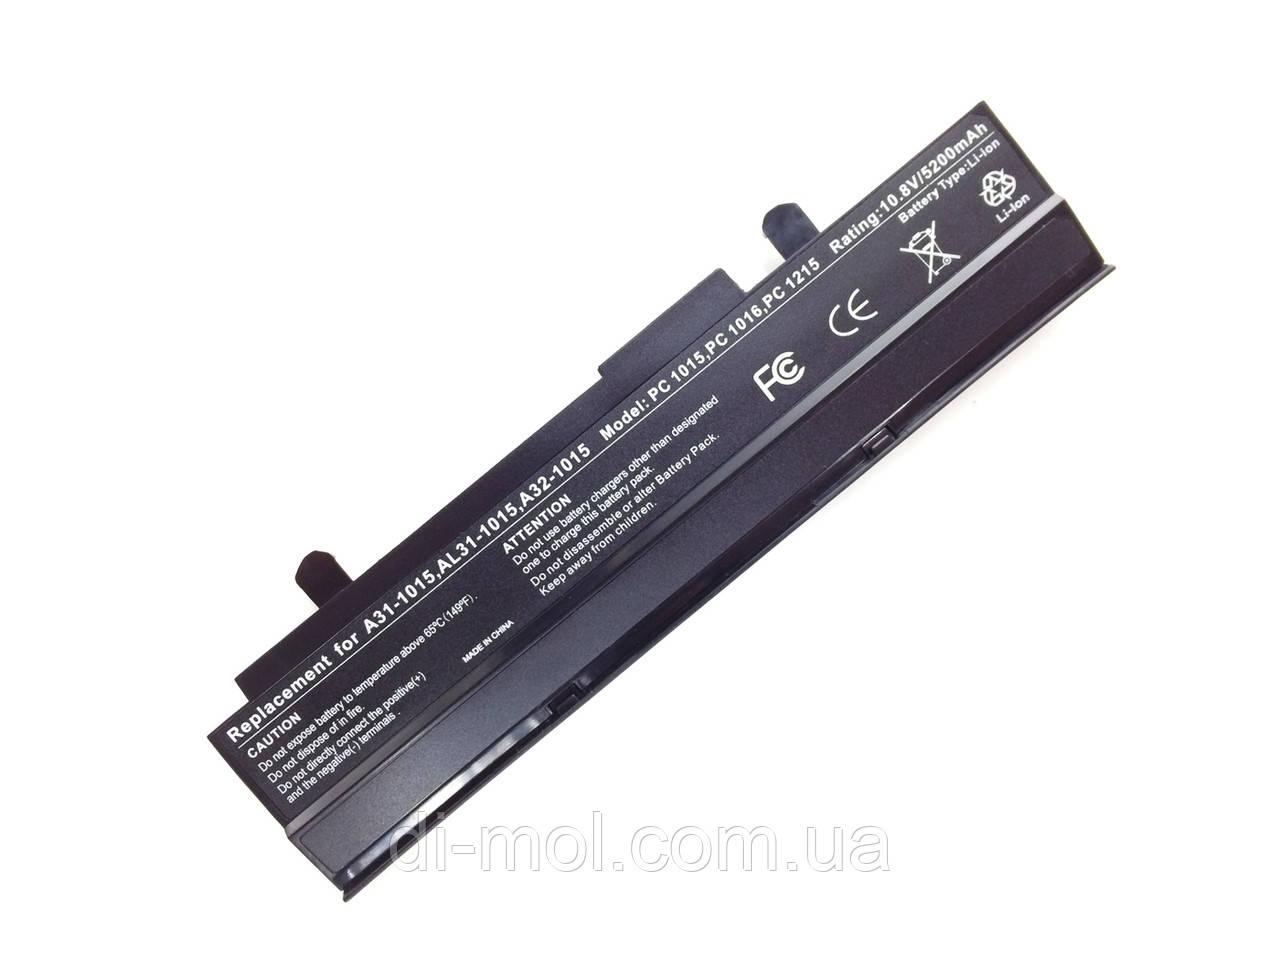 Аккумуляторная батарея для Asus Eee PC 1011, 1015, 1016, 1215, Lamborghini VX6 series 5200mAh black 11.1 v